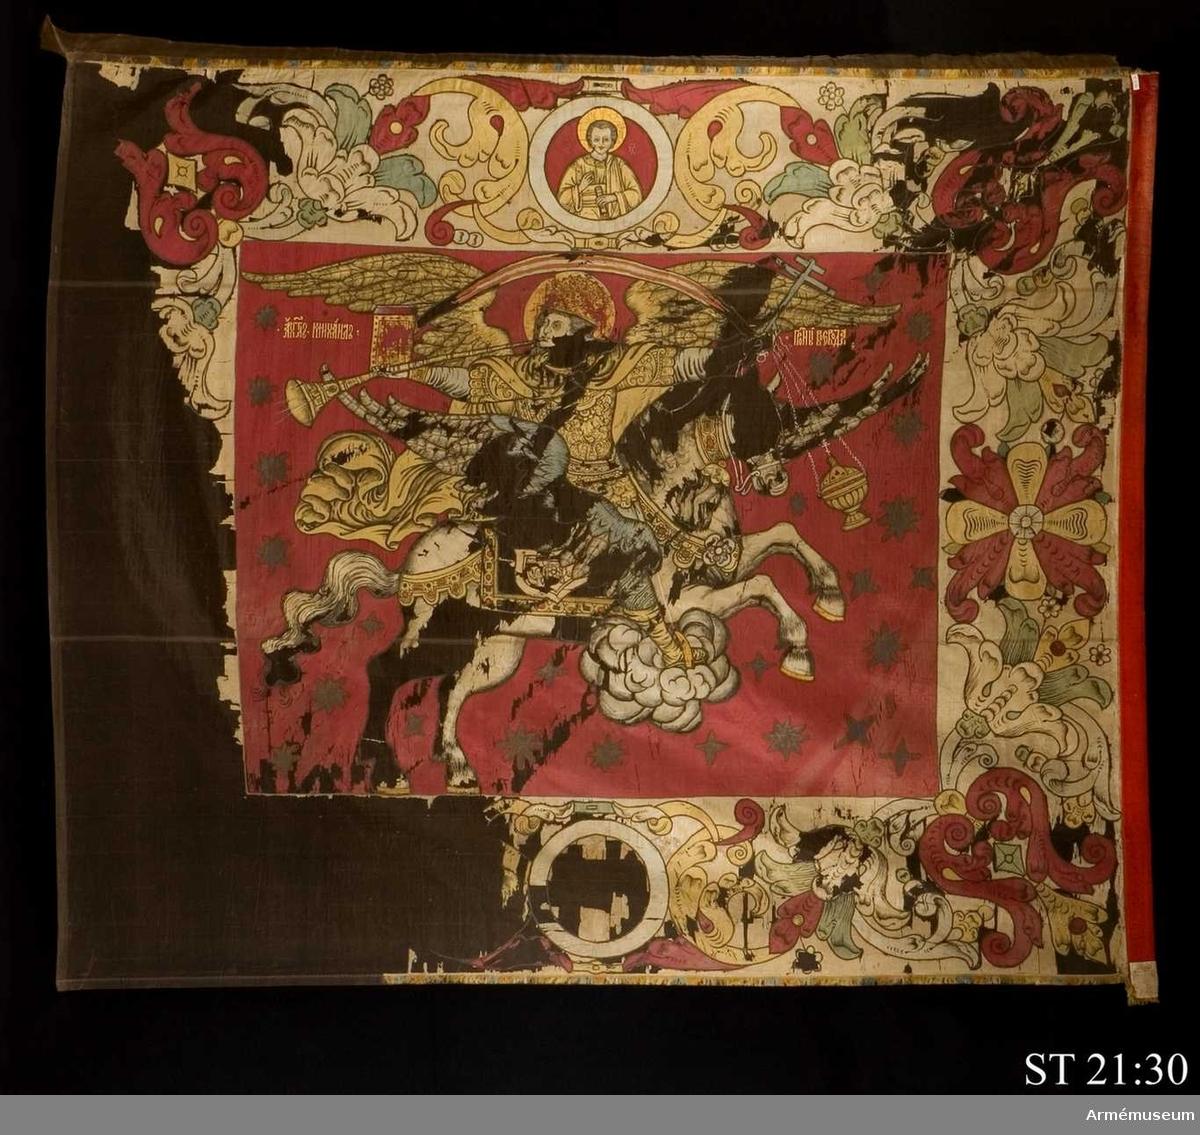 Huvudmotivet föreställer Sankt Mikael, apokalypsens ärkeängel.